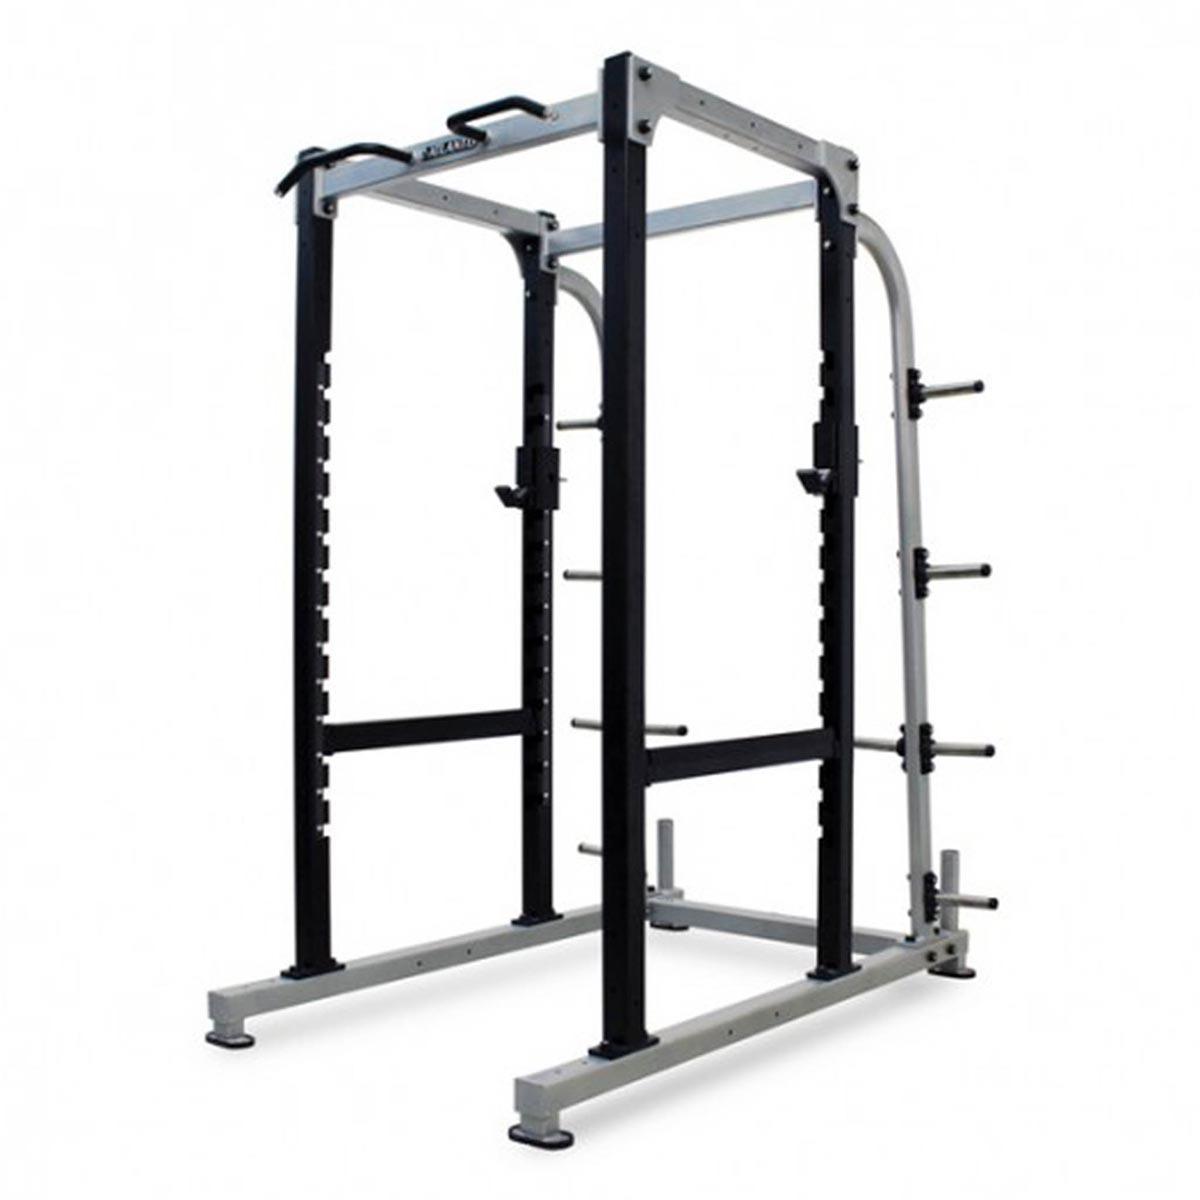 Richmond Free Weights - Atlantis C409 Power Rack - Lifestyle Equipment